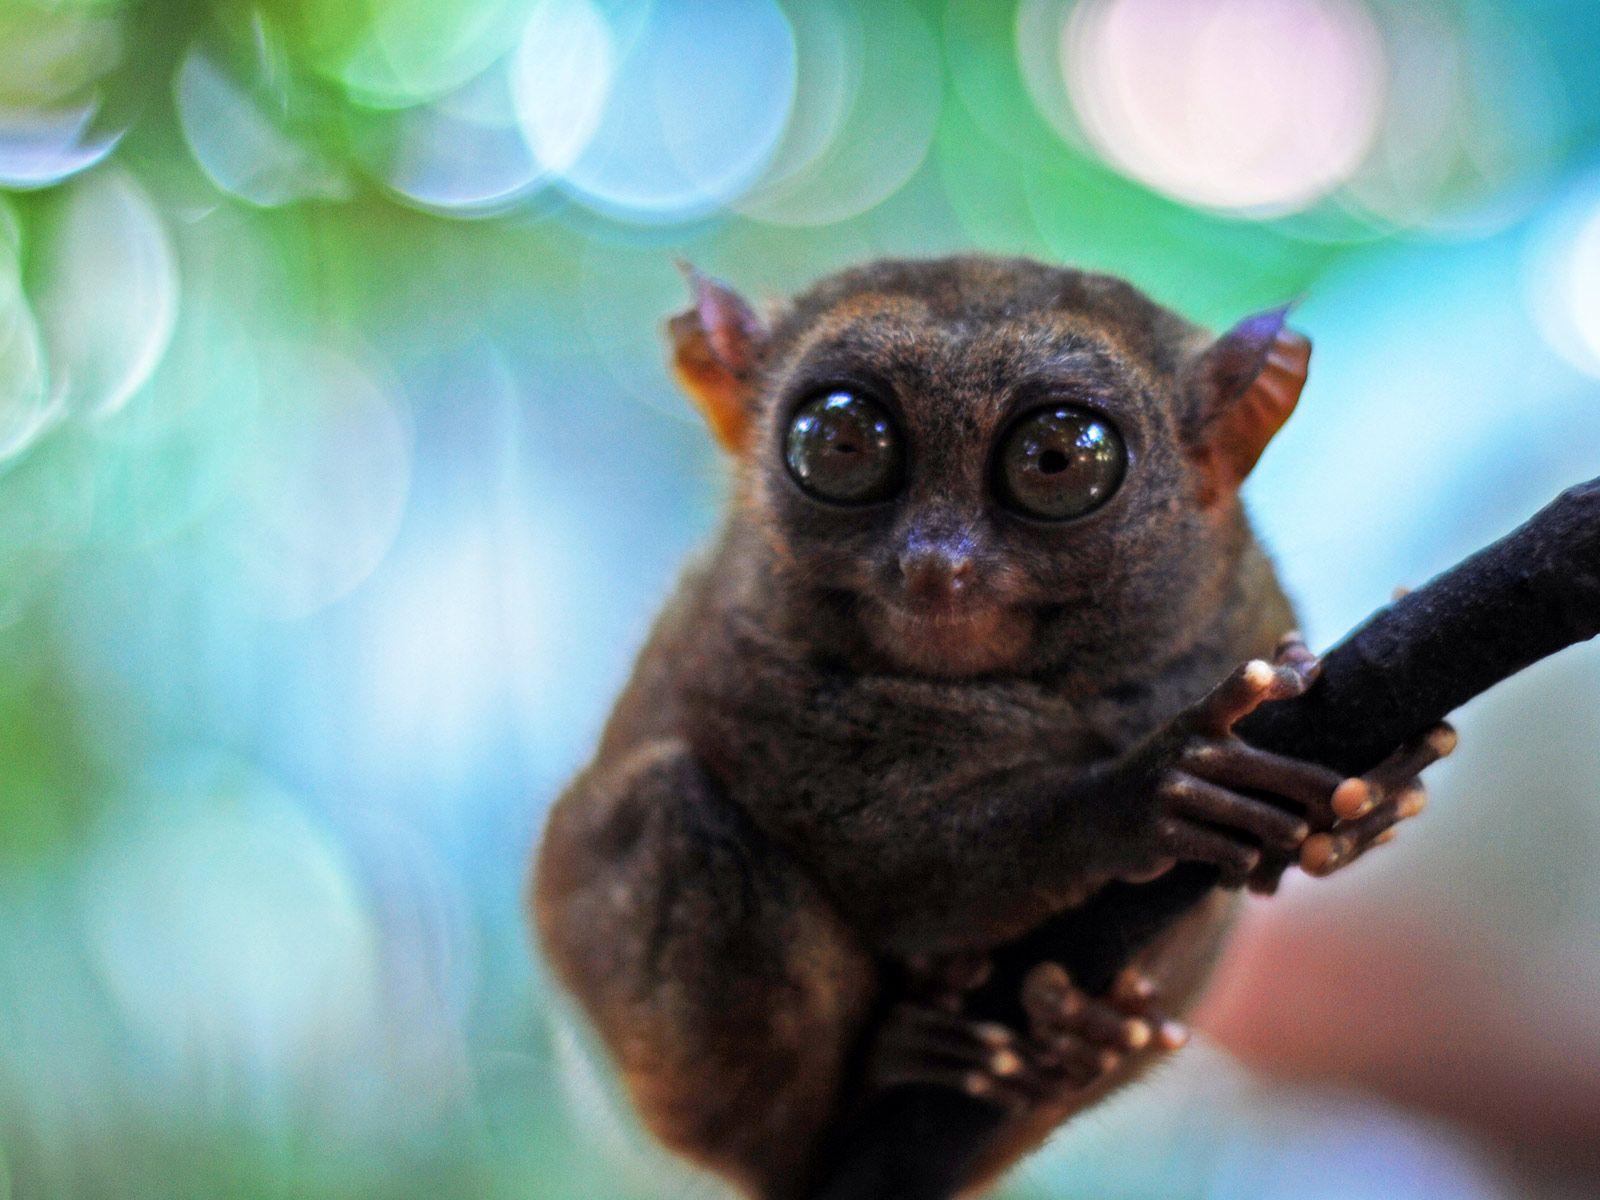 Cute Little Philippine Tarsier Monkey